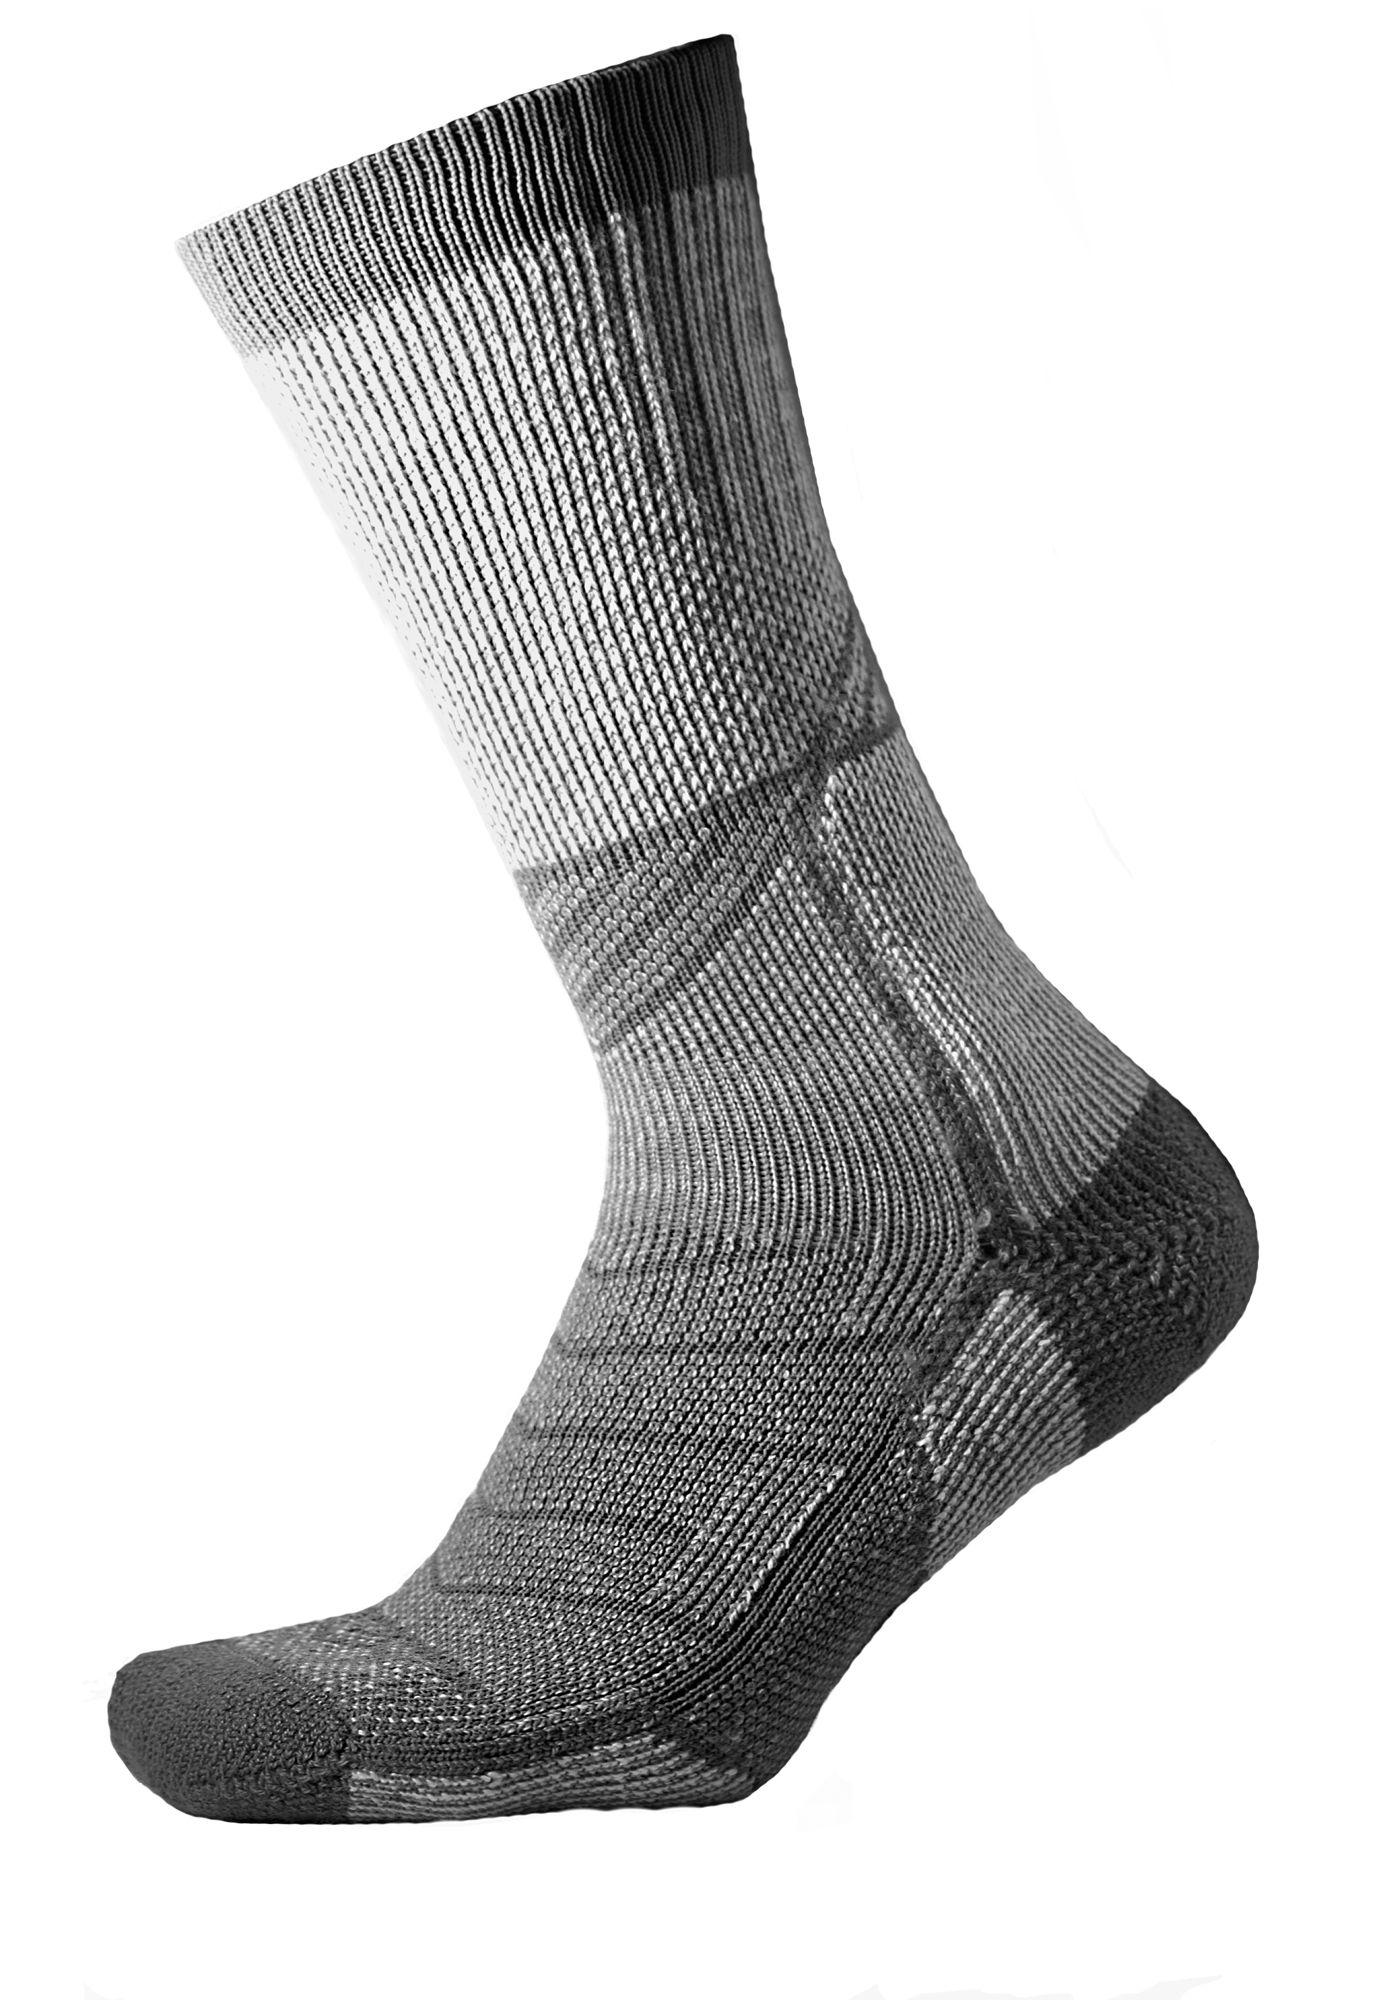 Thor-Lo Outdoor Explorer Crew Socks